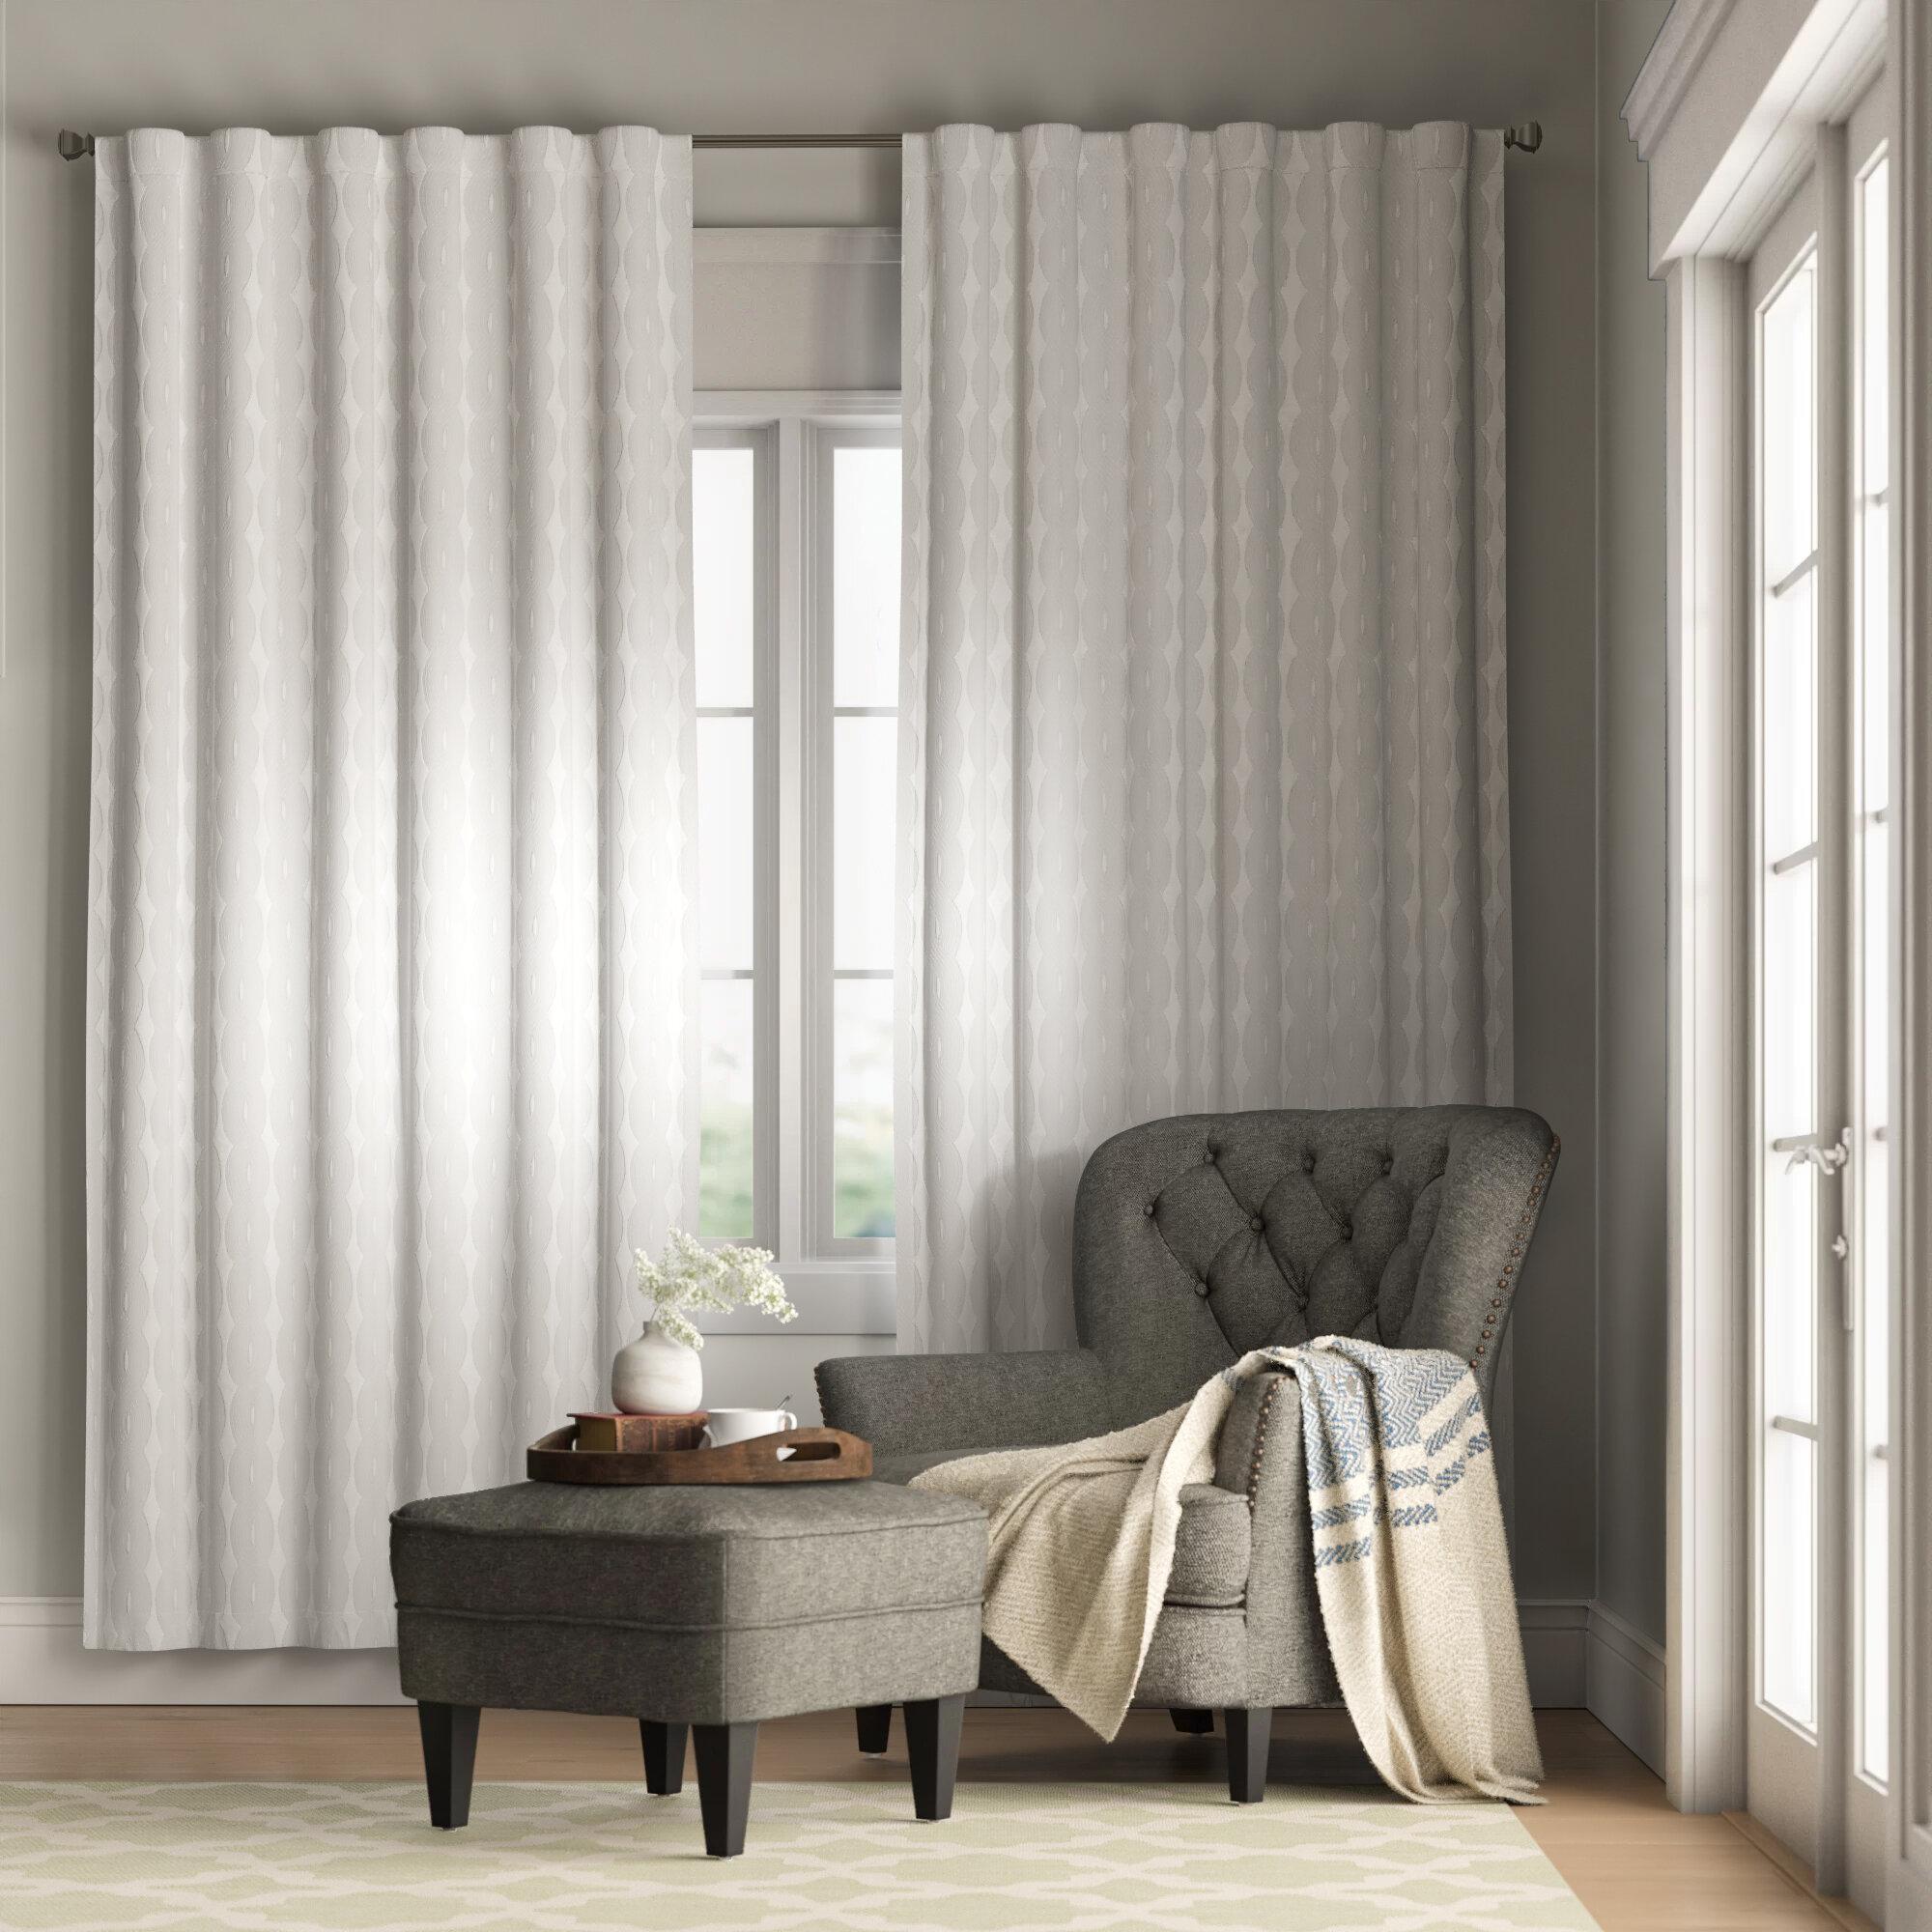 Huntington Geometric Room Darkening Thermal Rod Pocket Single Curtain Panel Reviews Birch Lane